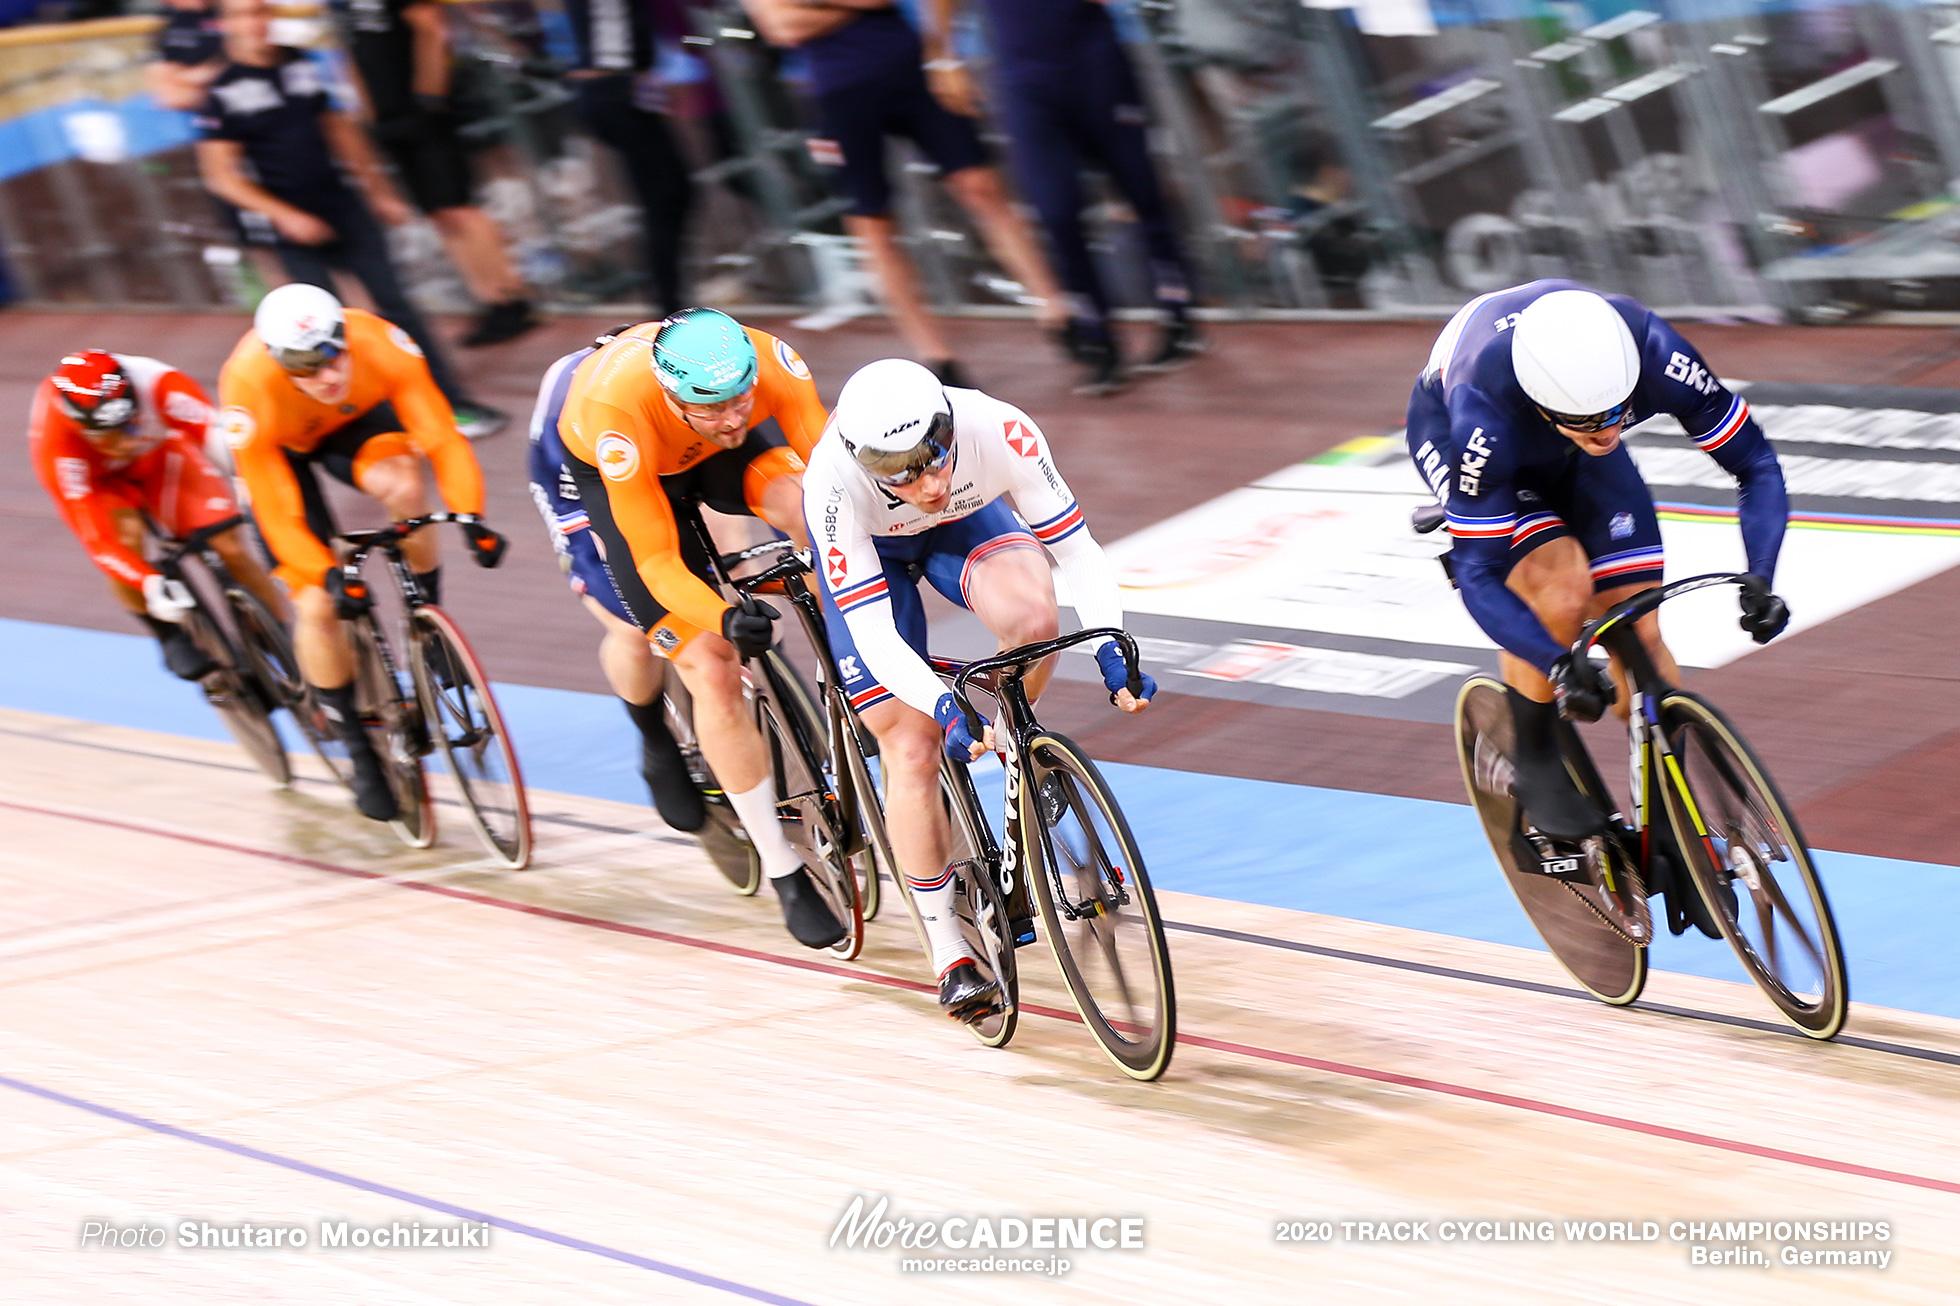 7-12 Final / Men's Keirin / 2020 Track Cycling World Championships